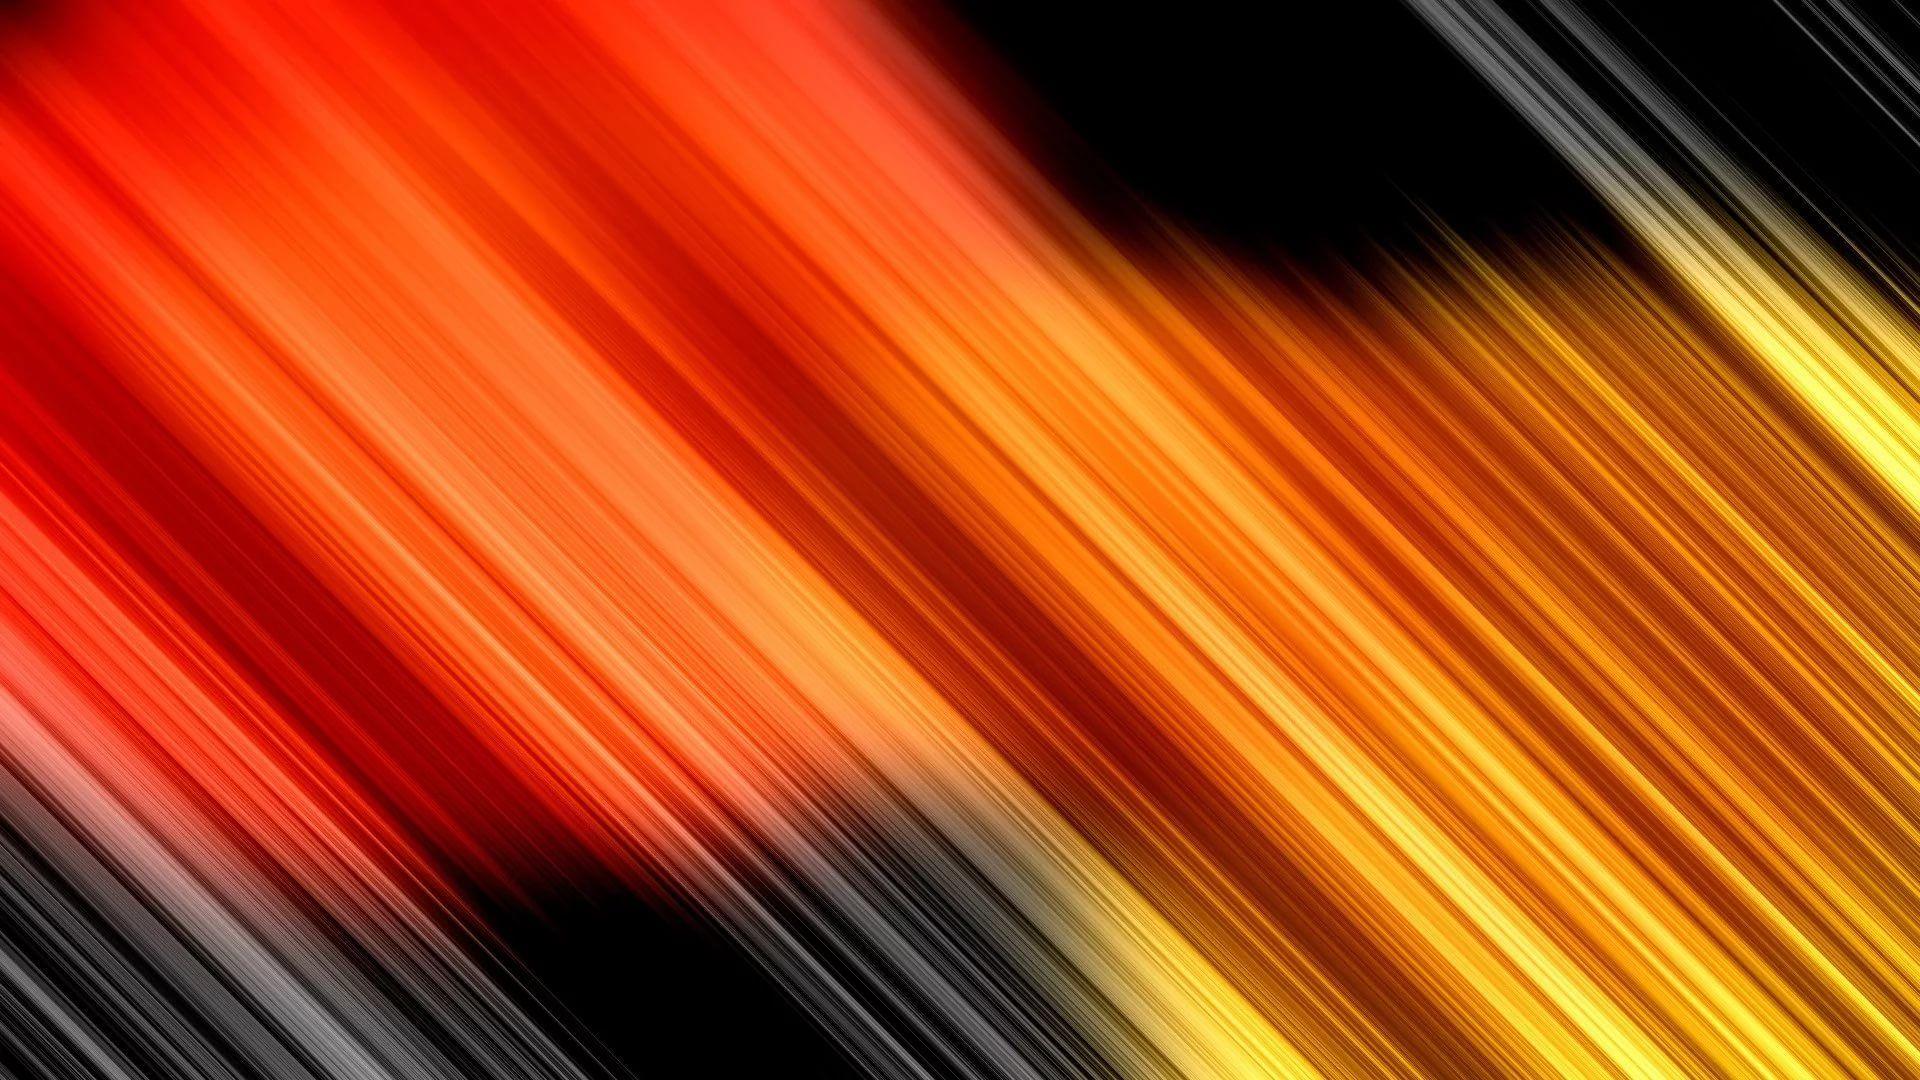 Black And Orange screen wallpaper